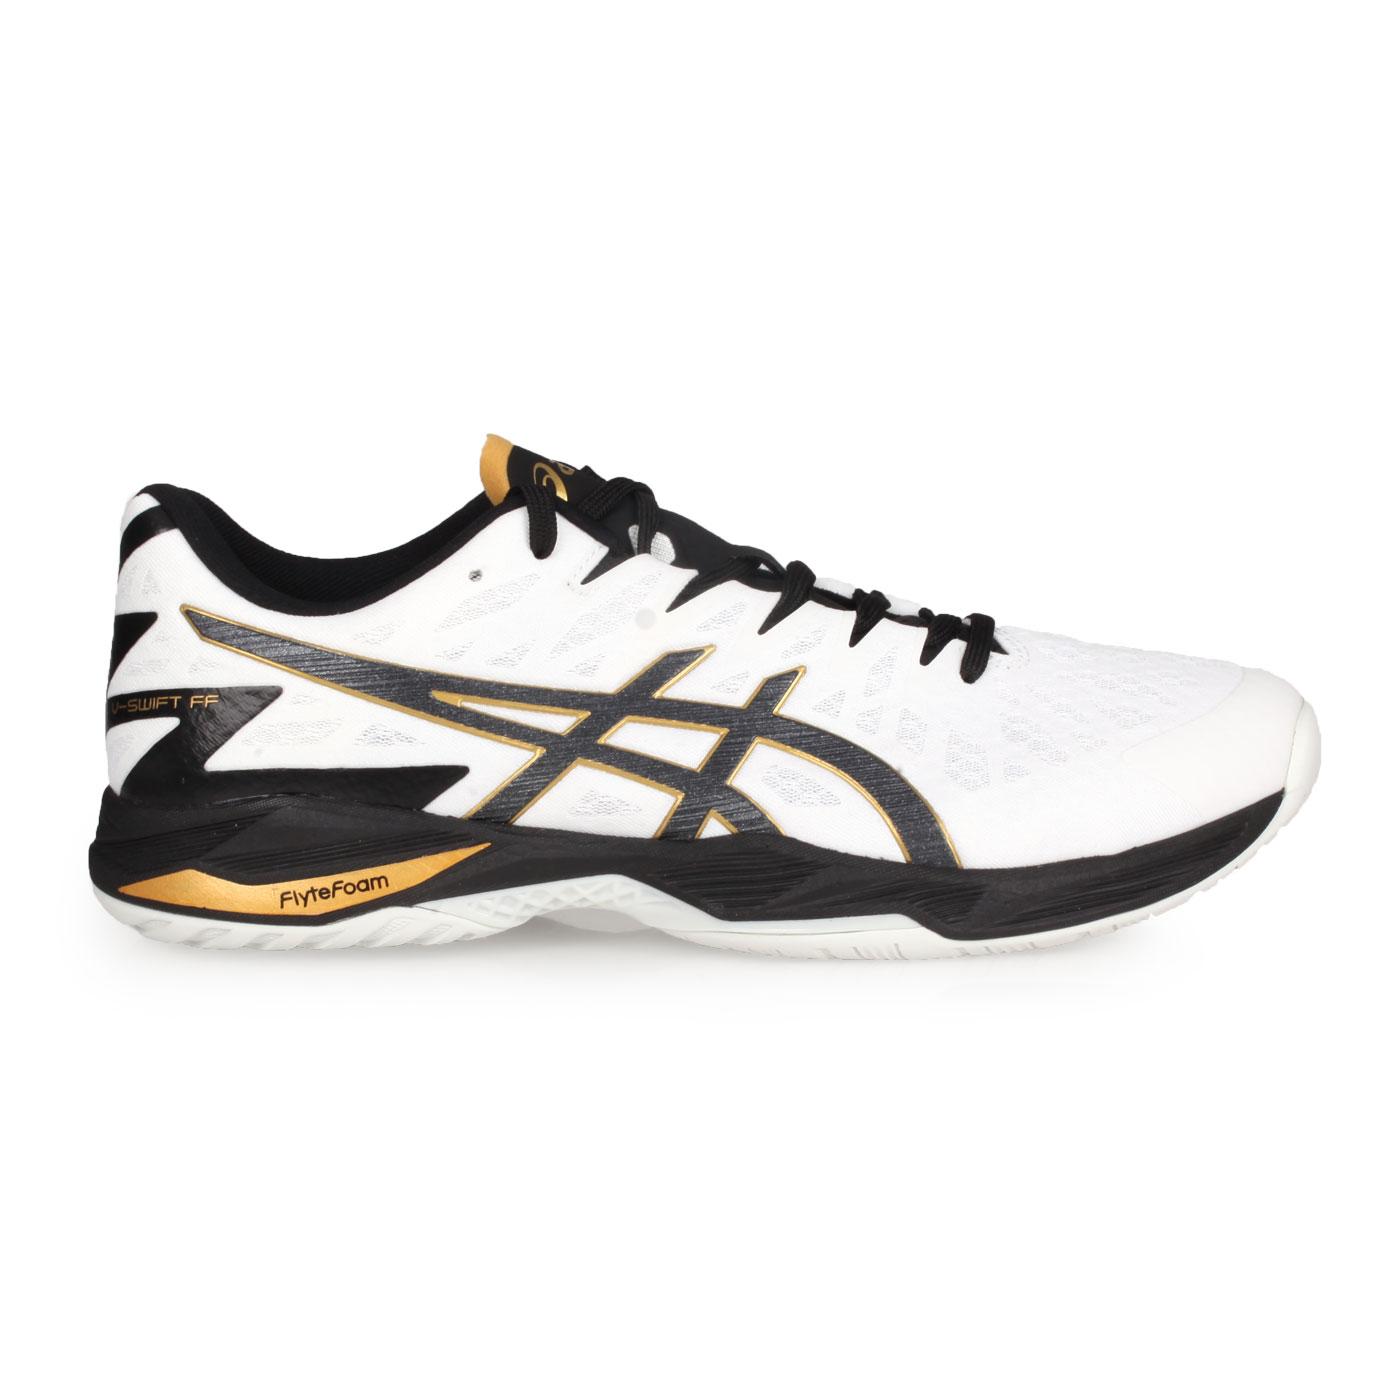 ASICS 排羽球鞋  @V-SWIFT FF 2@1053A027-100